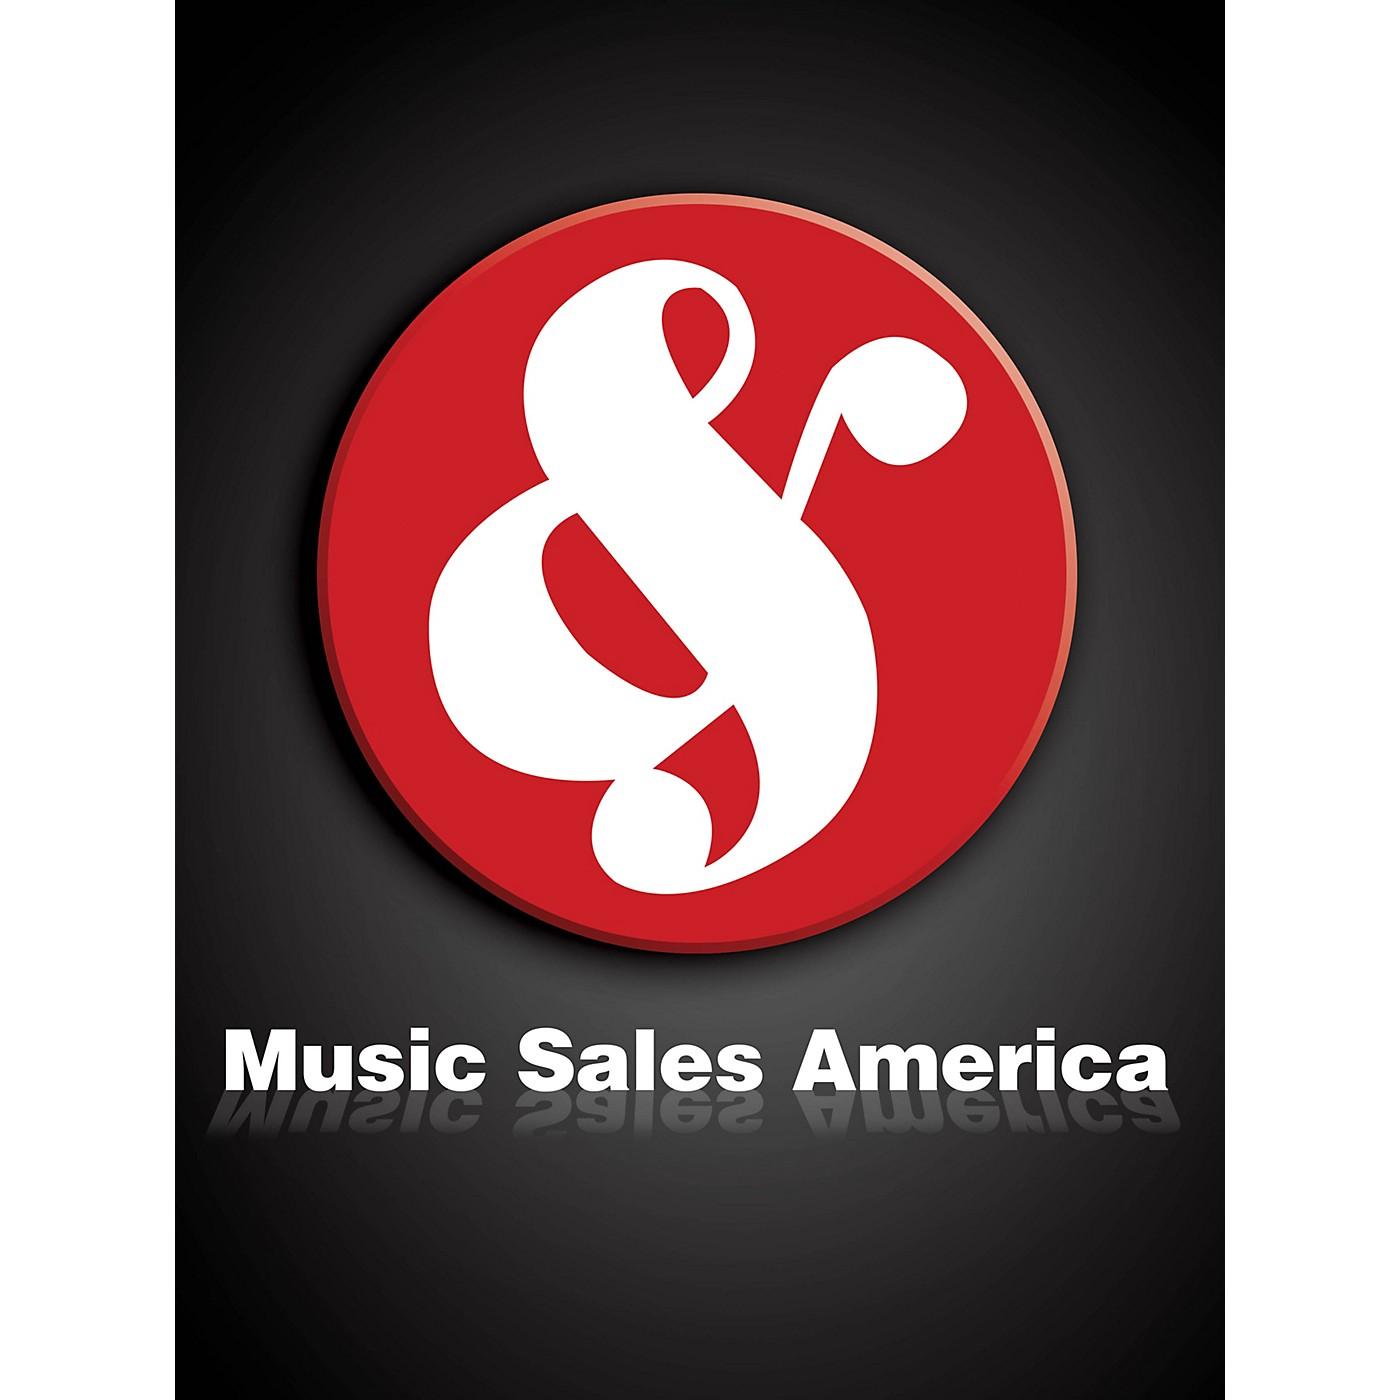 Hal Leonard Hallelujah Chorus (SATB with Organ, New Engraving) SATB Composed by George Friedrich Handel thumbnail